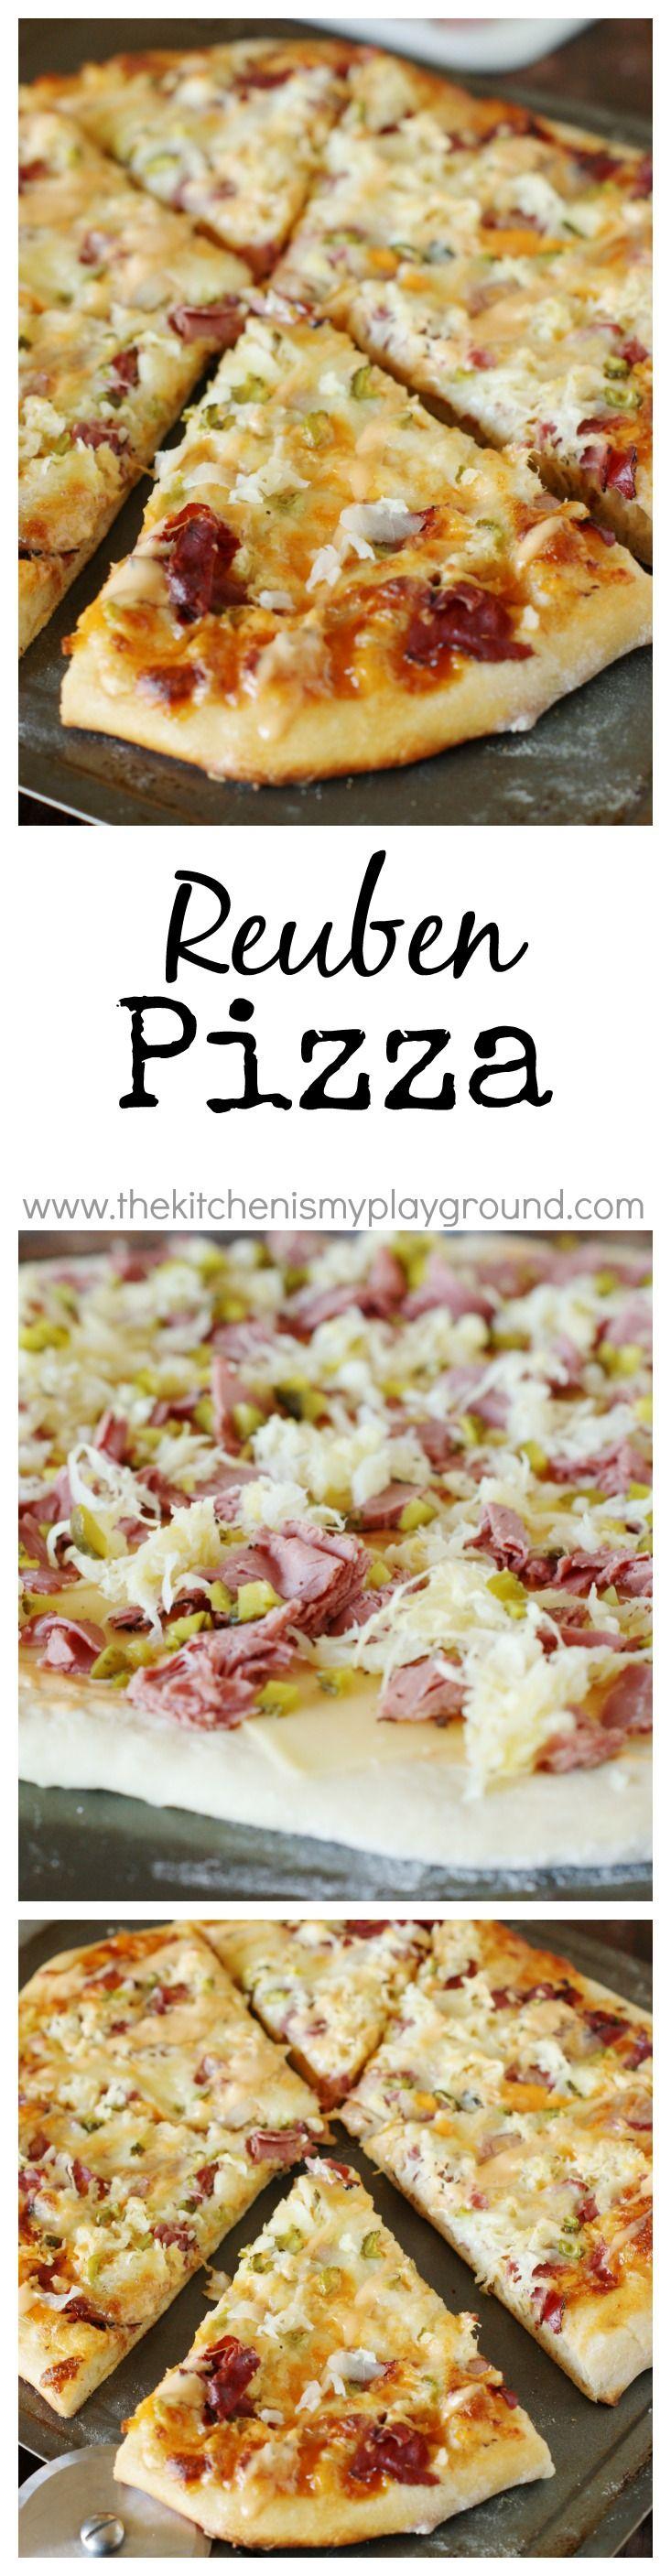 Reuben Pizza ~ enjoy the wonderful flavors of the classic-favorite Reuben sandwich in scrumptious pizza form!   www.thekitchenismyplayground.com